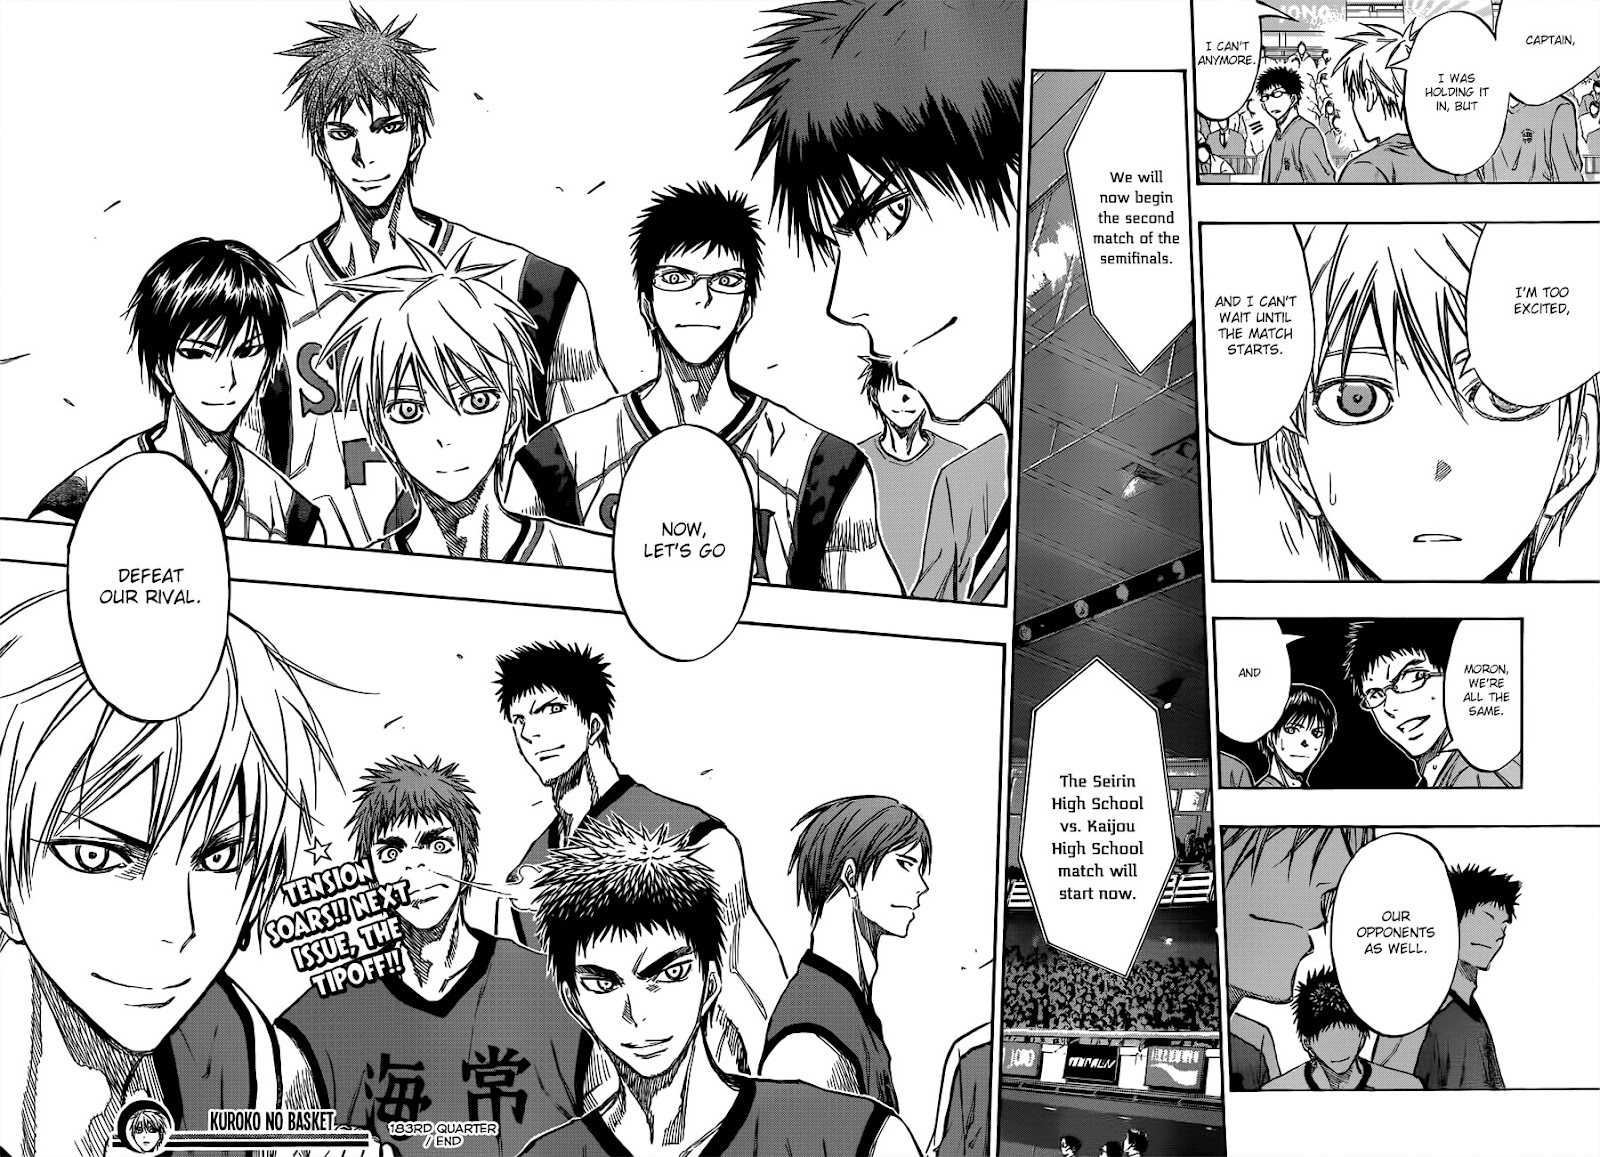 Kuroko no Basket Manga Chapter 183 - Image 18-19